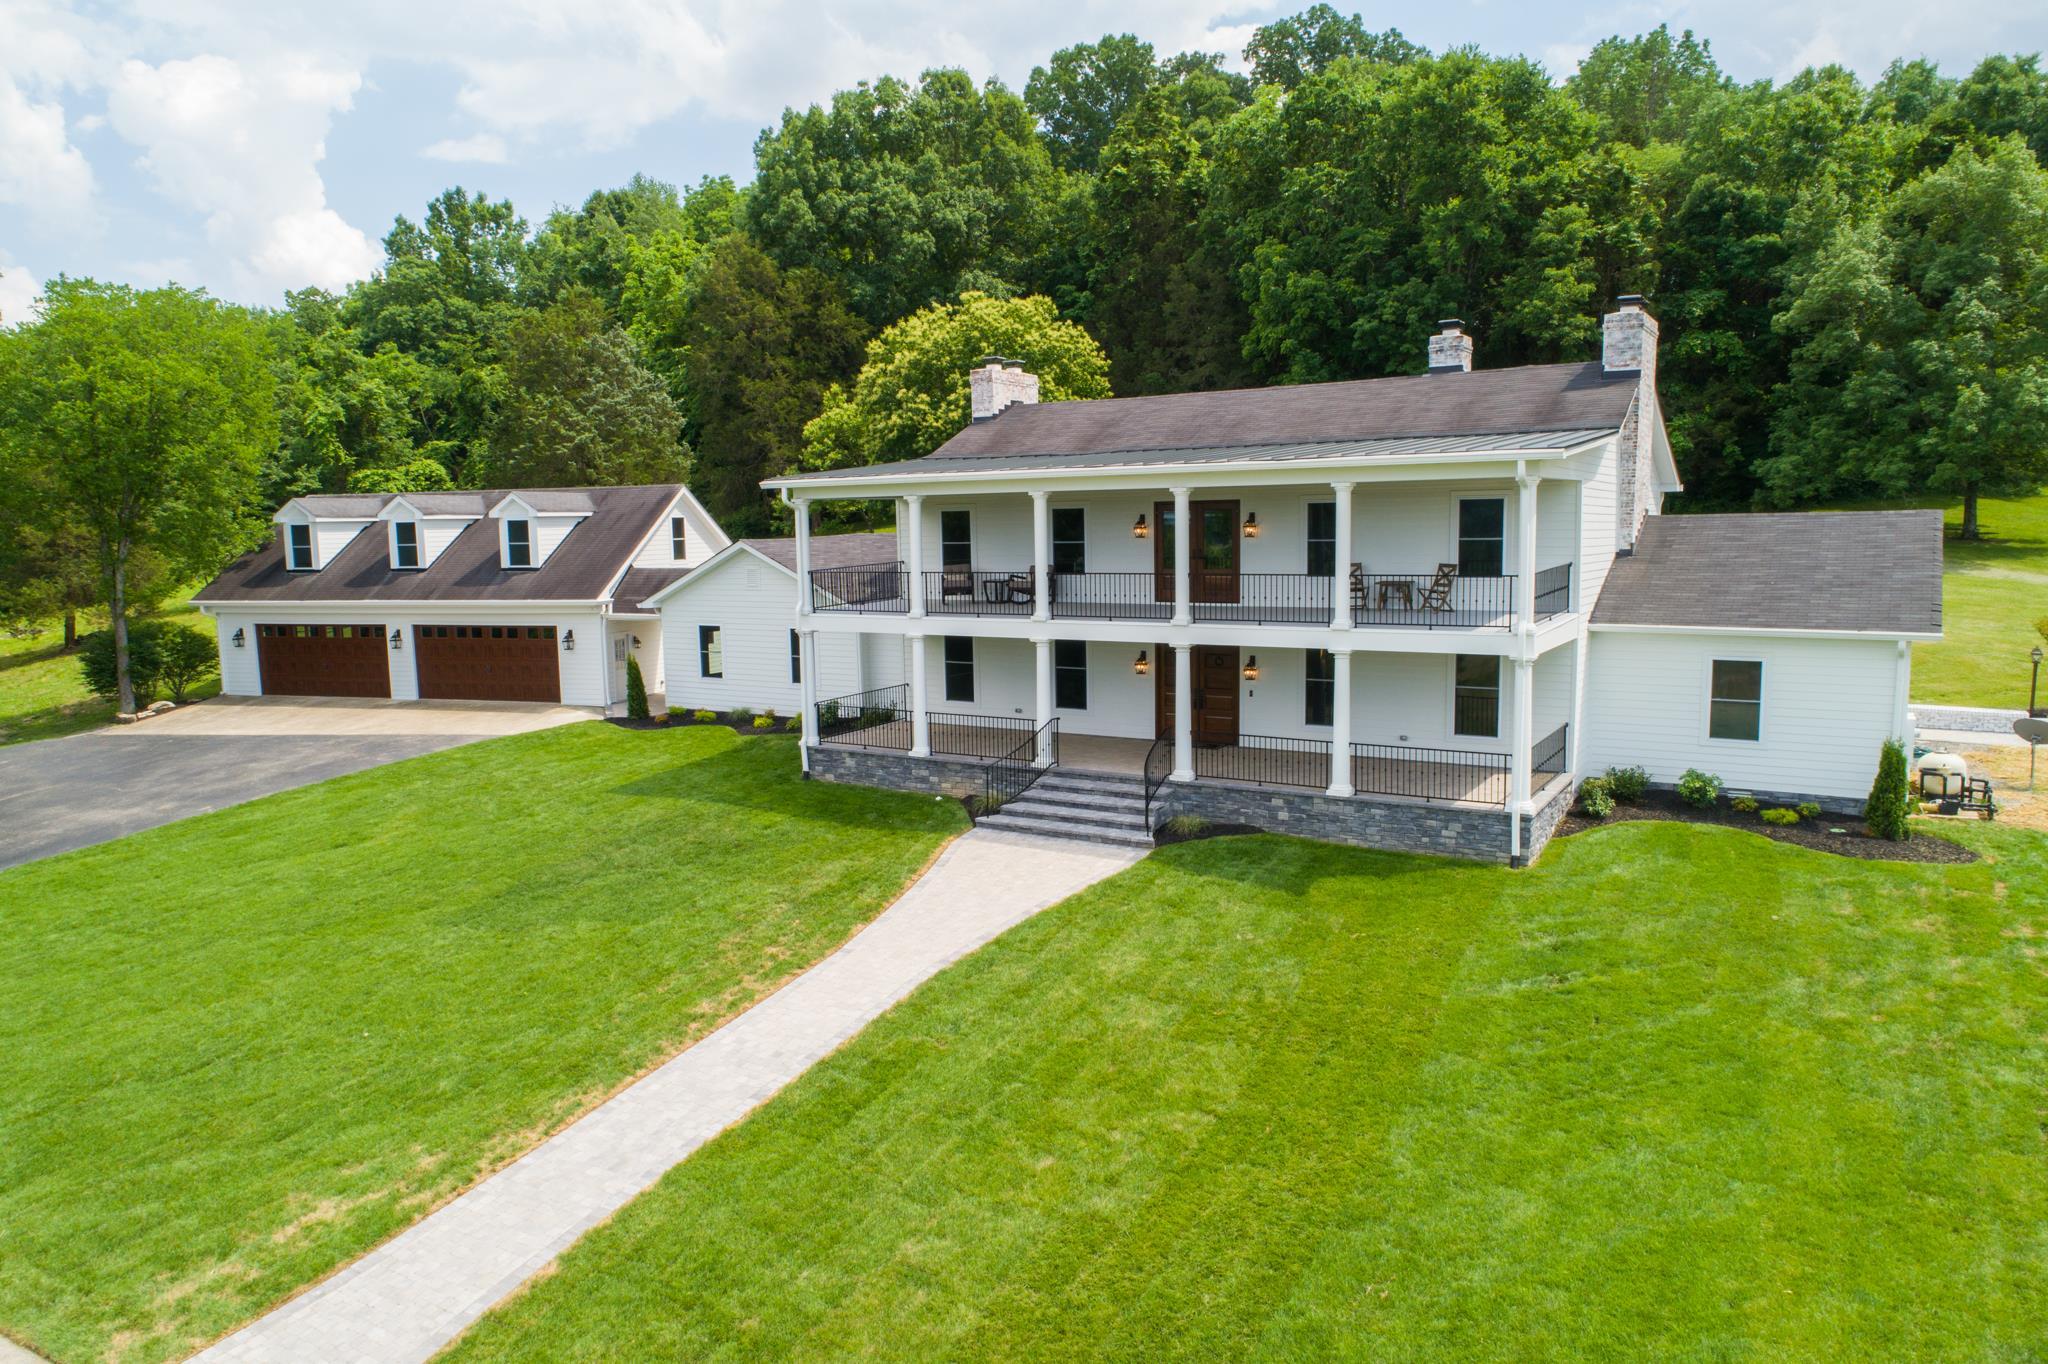 4411 Franklin Rd, Lebanon, TN 37090 - Lebanon, TN real estate listing